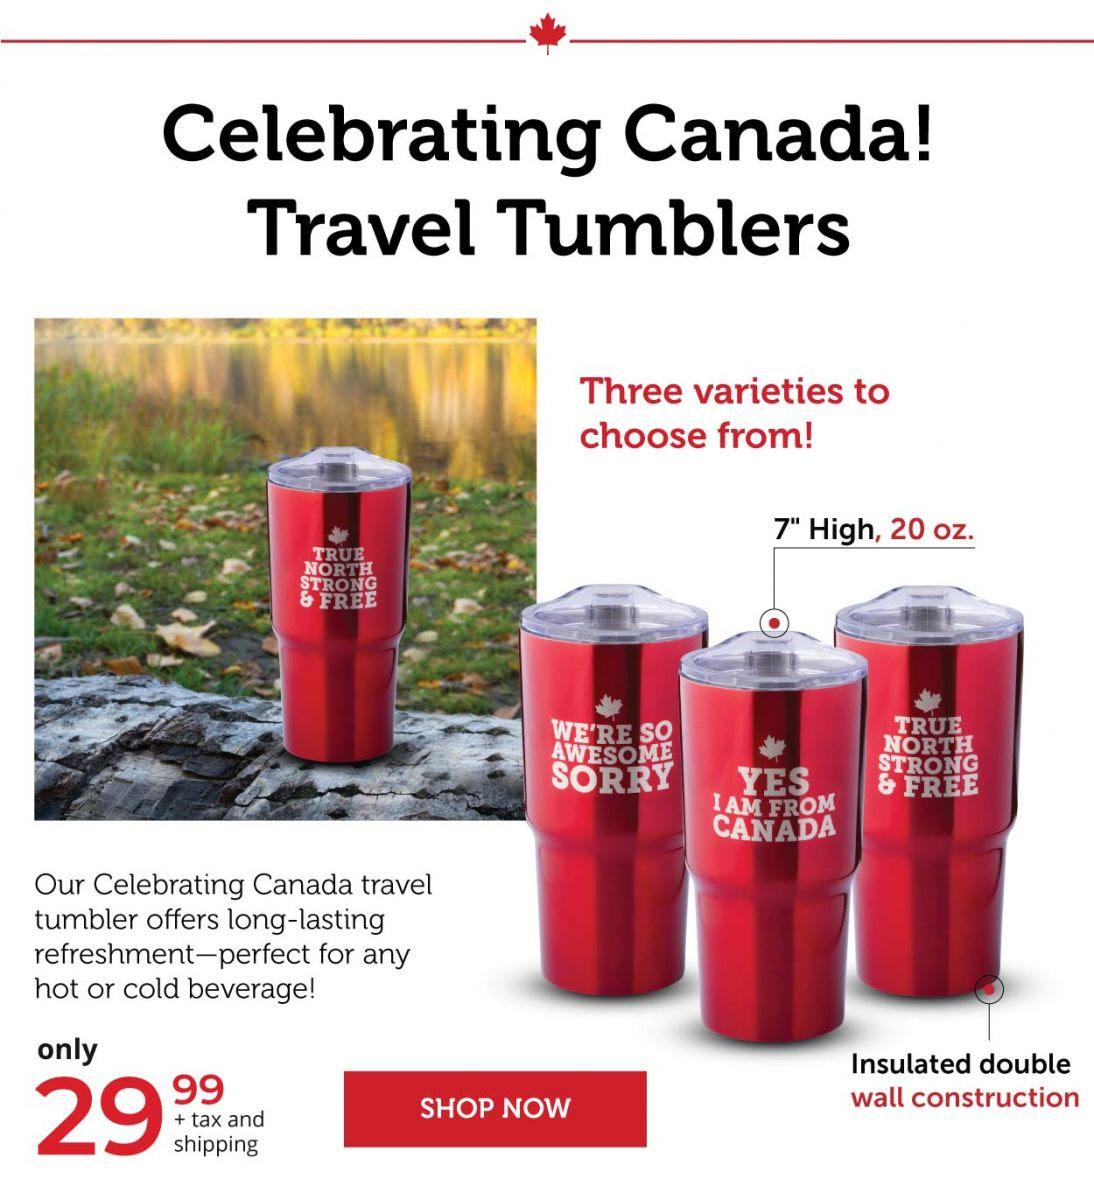 Celebrating Canada Travel Tumblers!